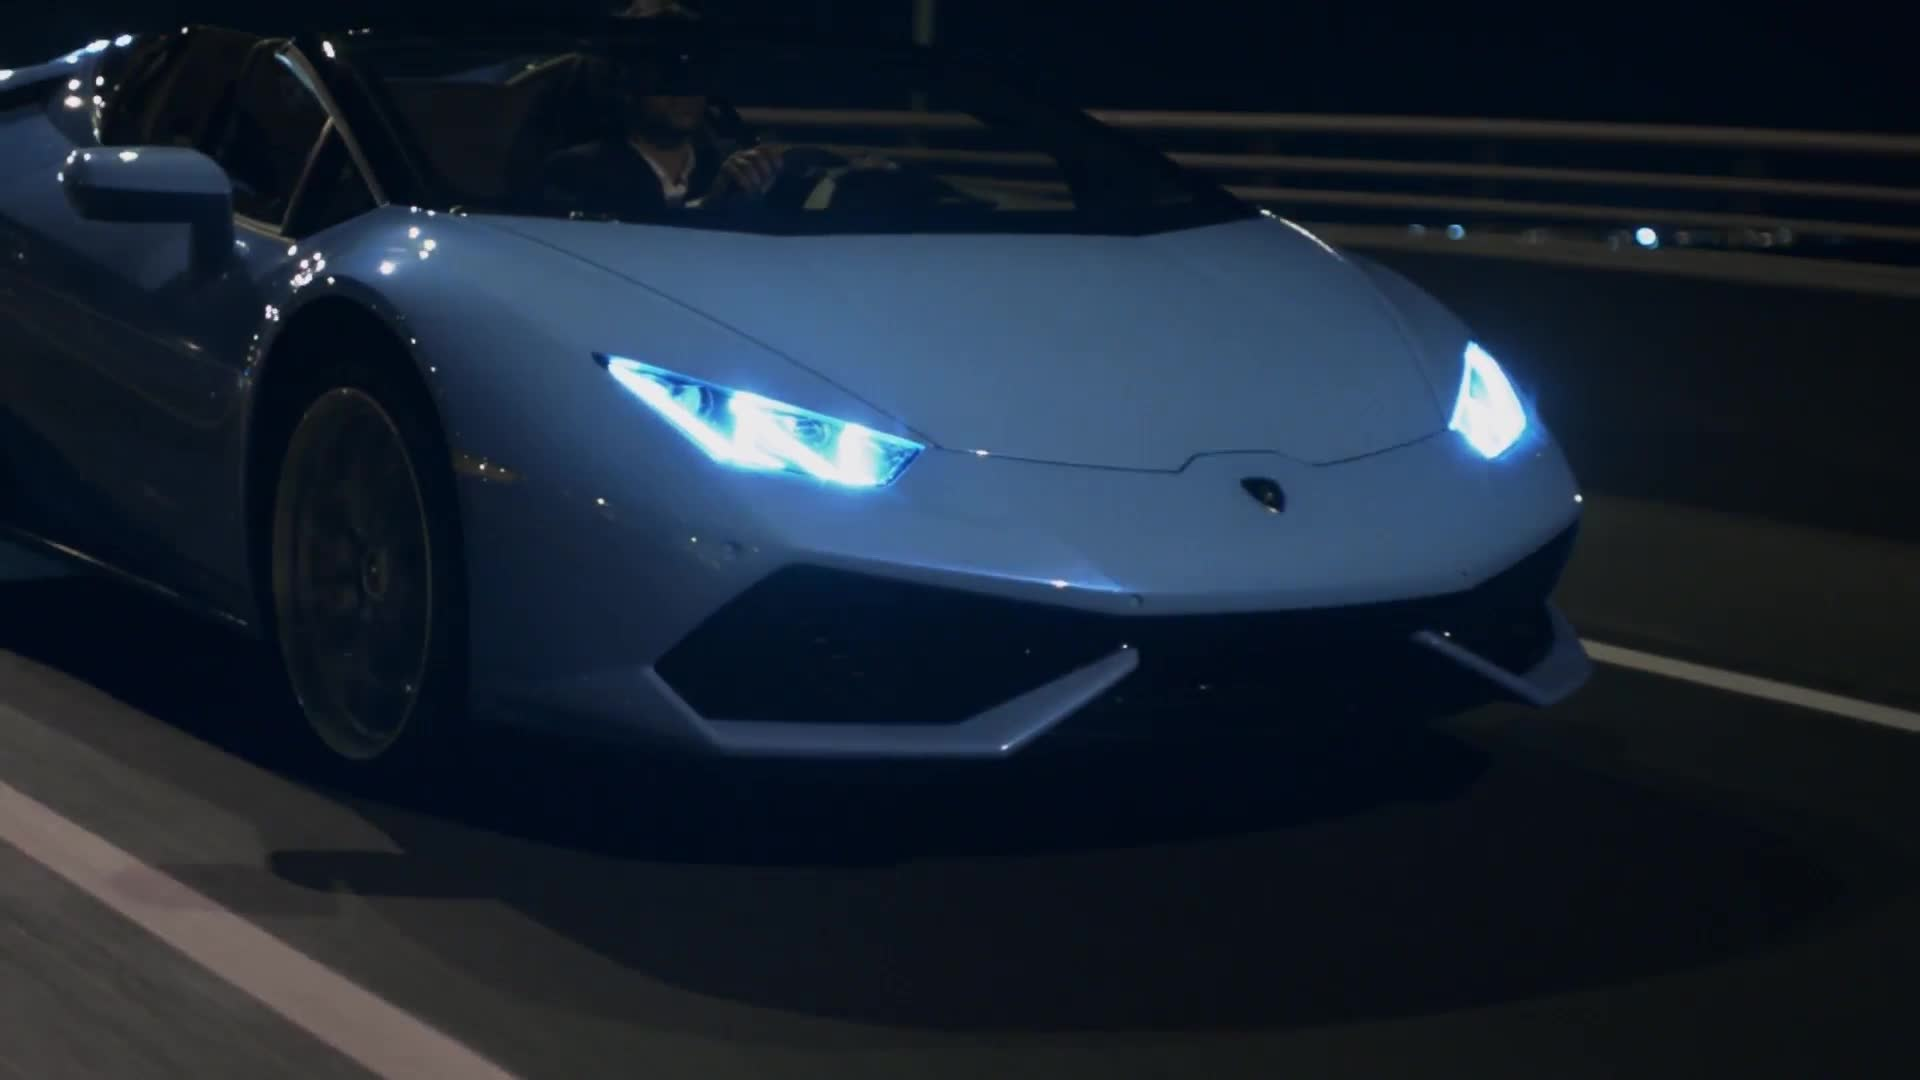 Lamborghini Presents Huracán Model Range at the 2016 Beijing Motorshow